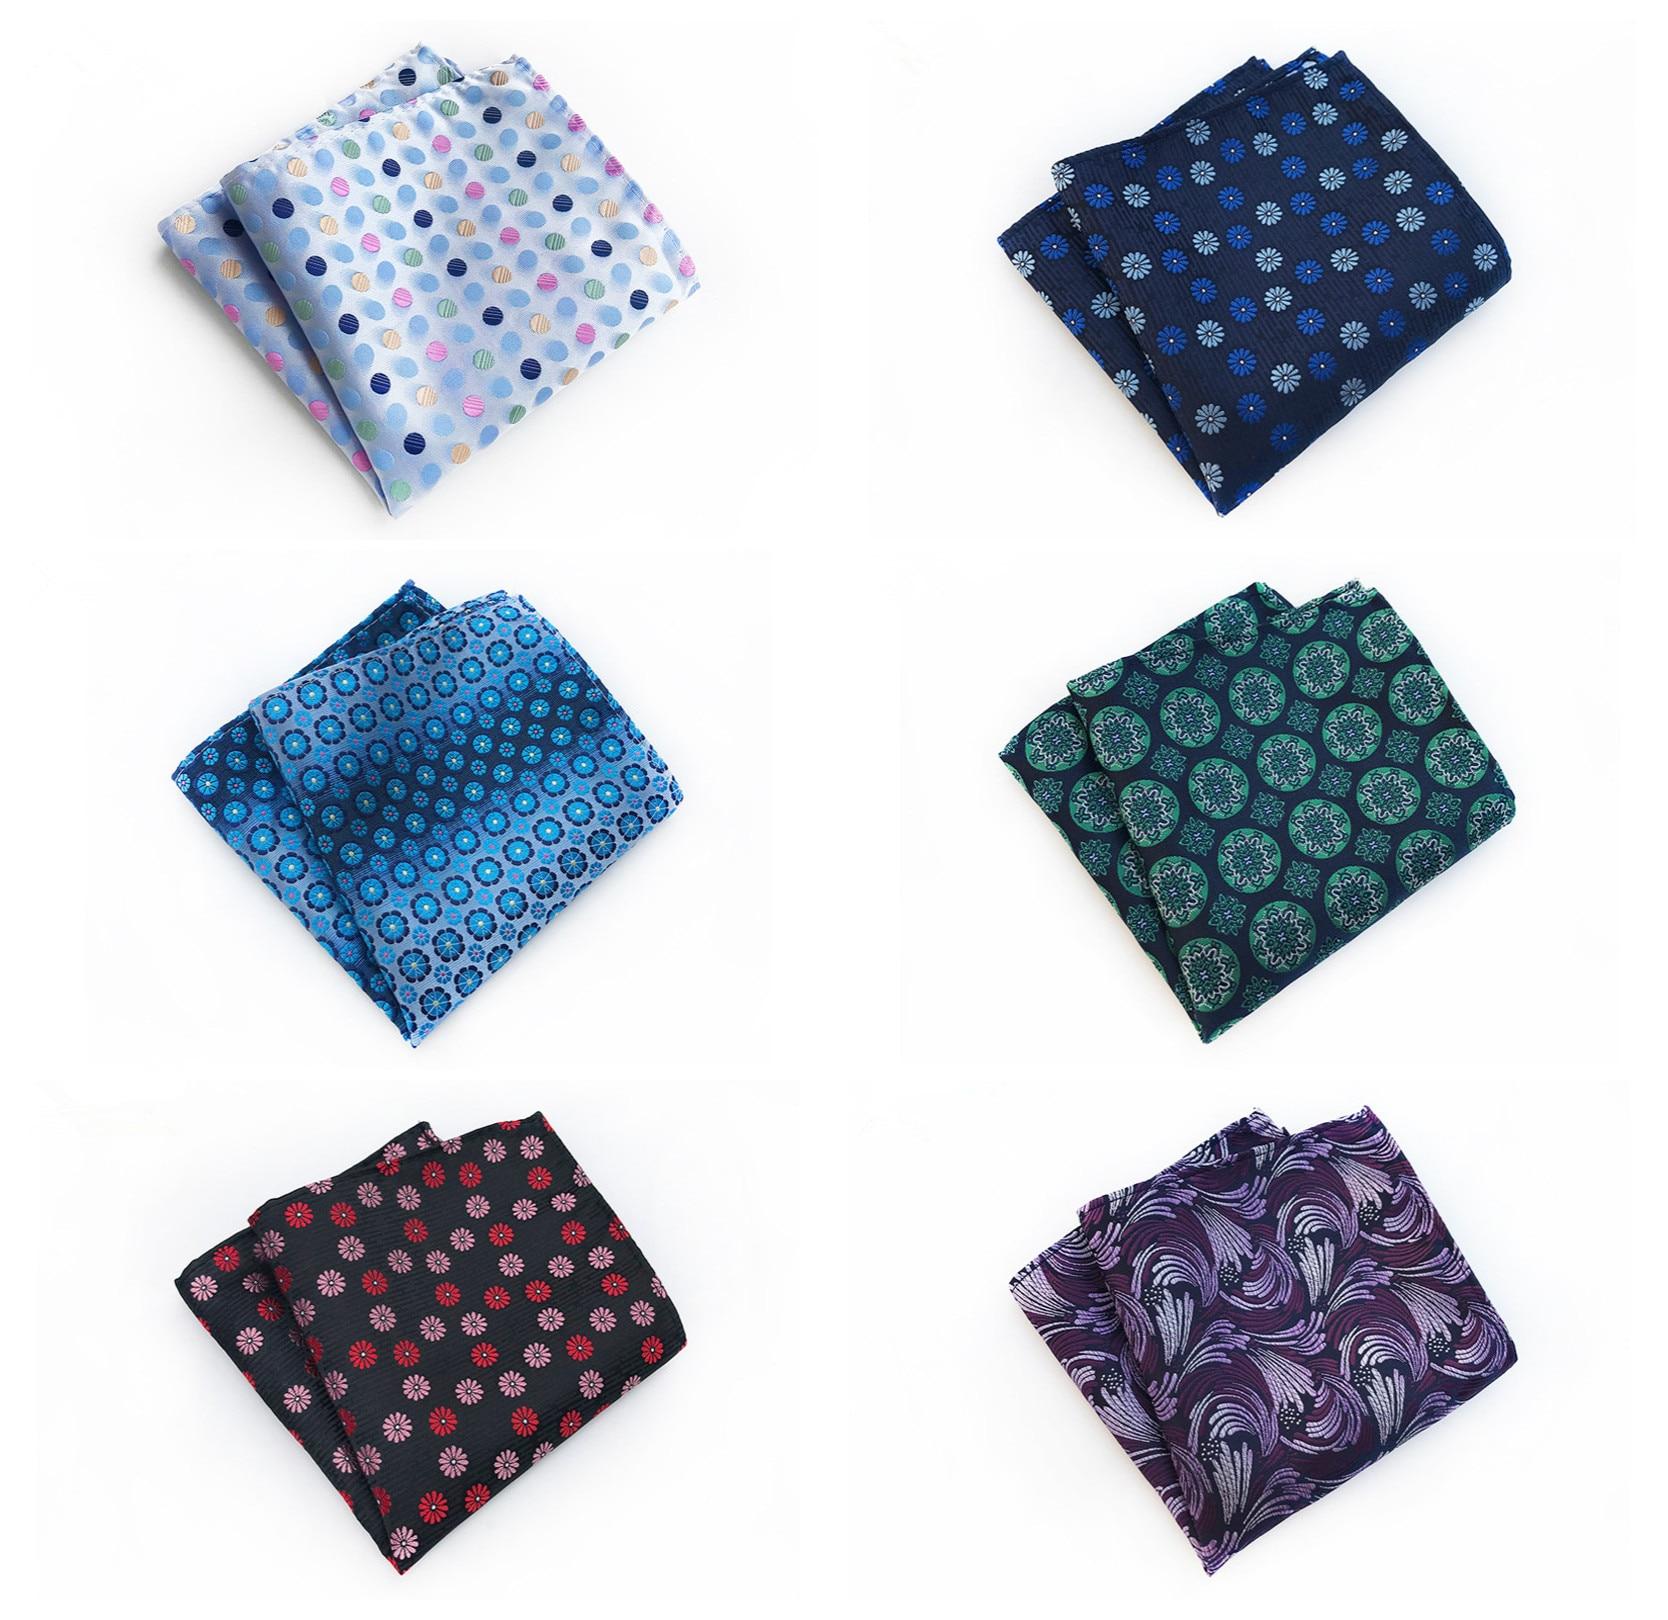 Men's Business Party Dresses Decorative Pocket Towels 2019 Fashion New Polyester Material Fashion Floral Set Pocket Towel